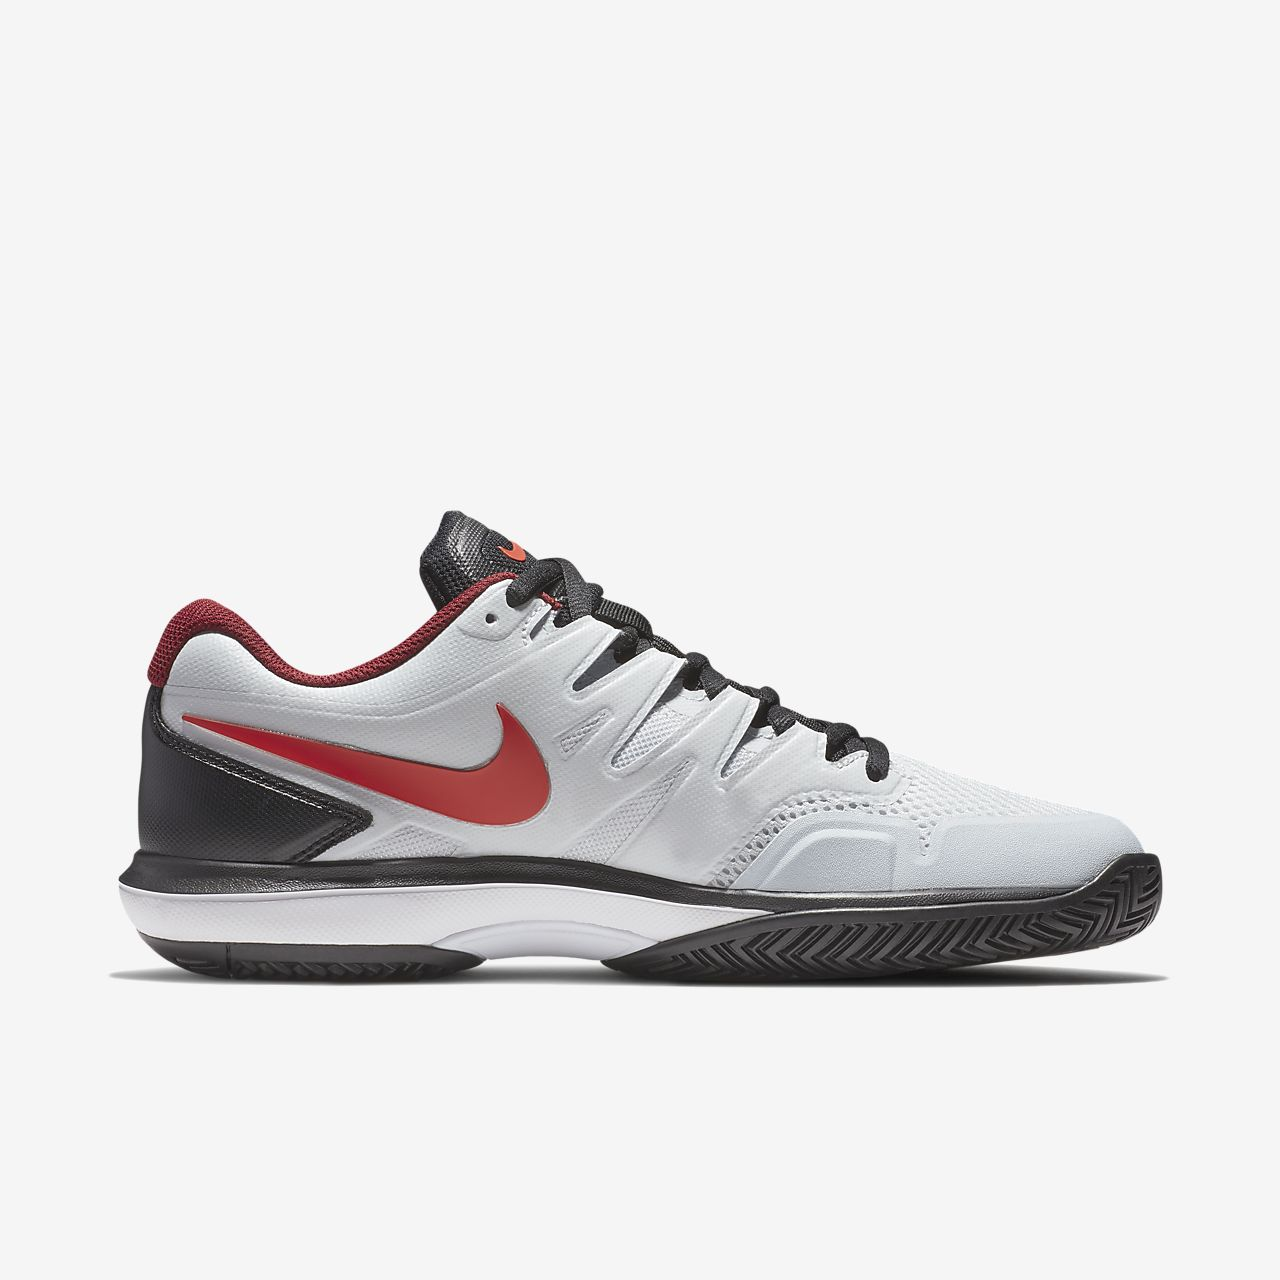 scarpe tennis nike ragazzo